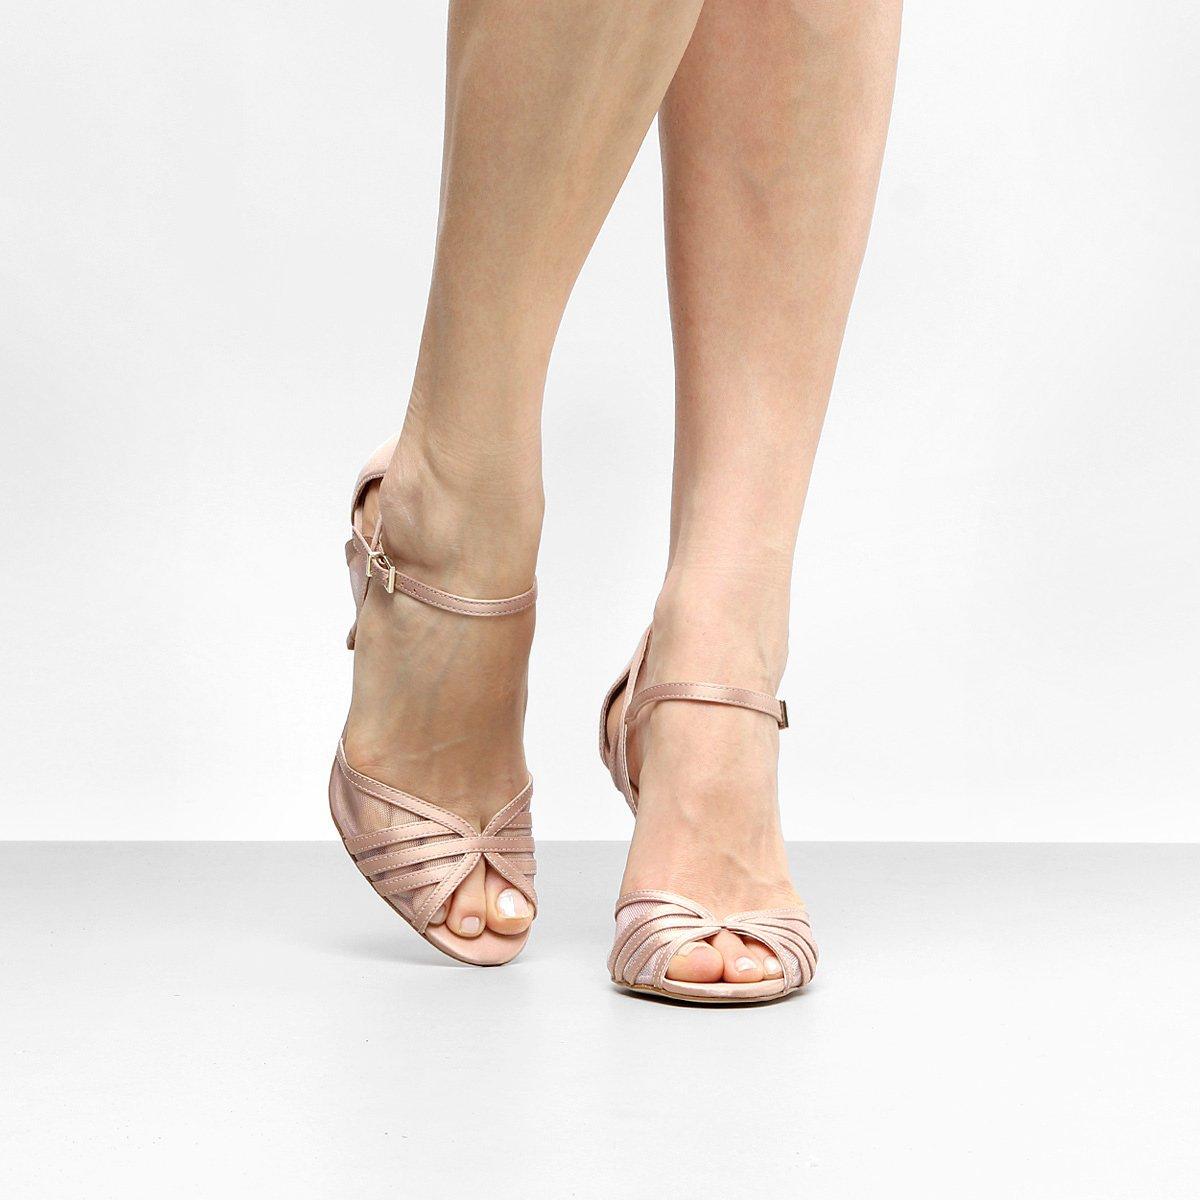 c0bb79d765 Sandália Shoestock Salto Fino Transparente Feminina